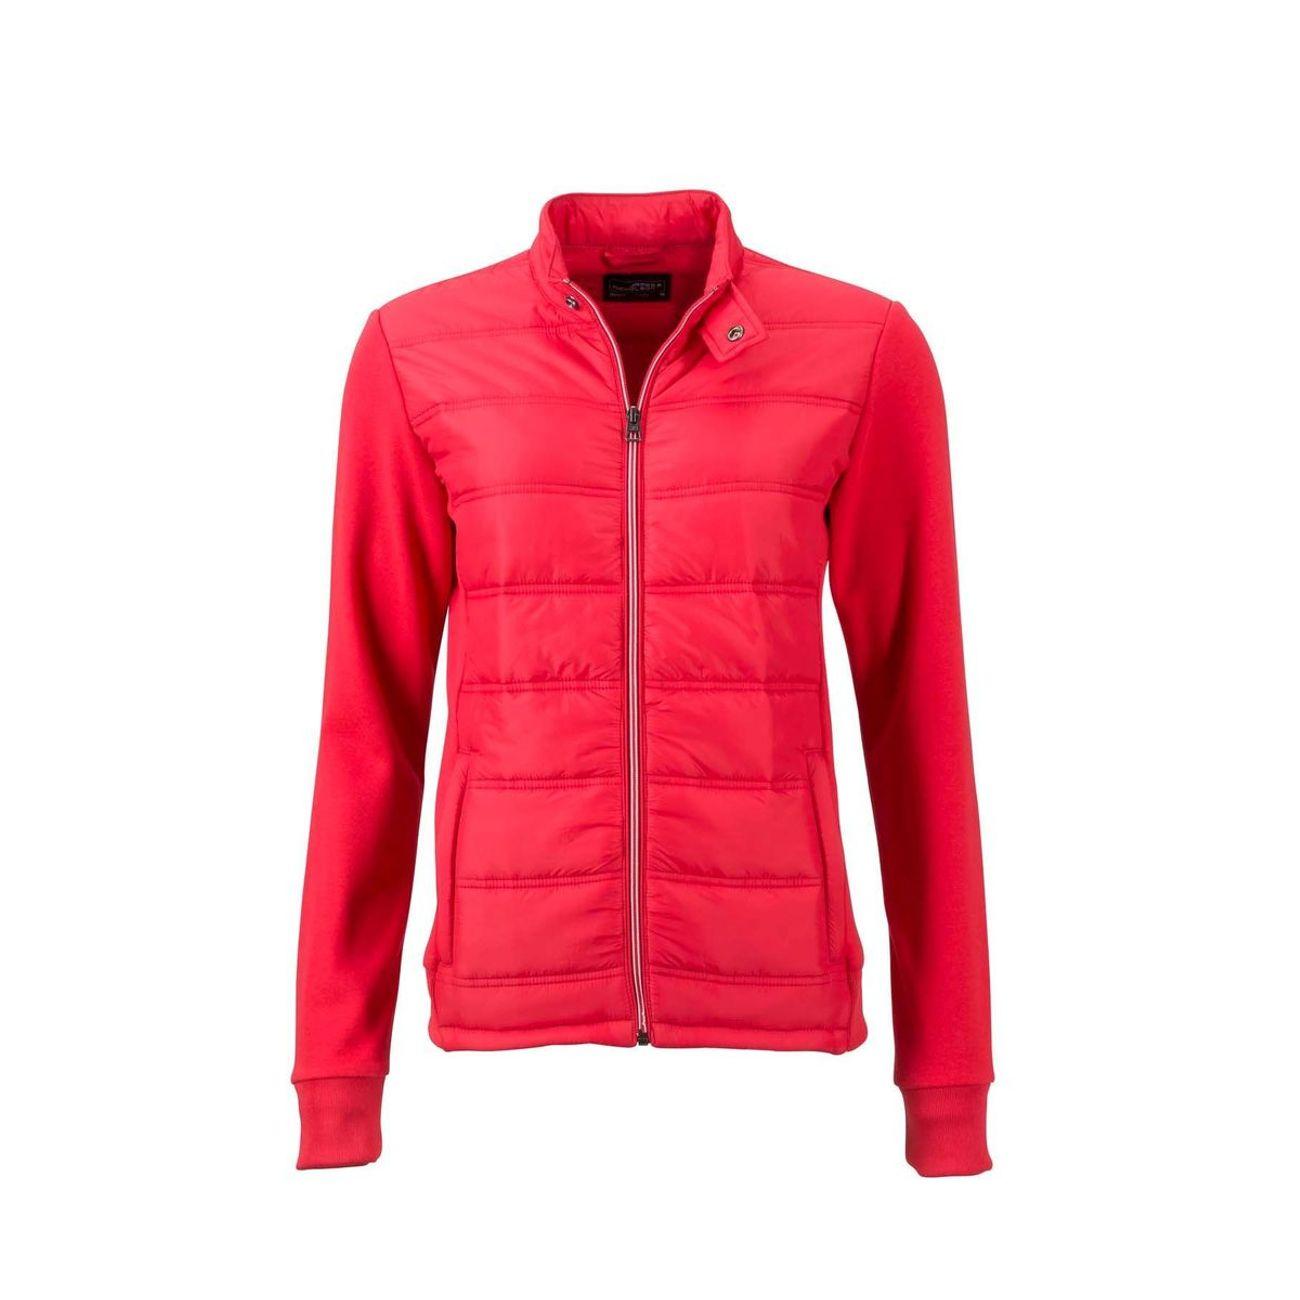 rouge Femme JN1123 style hybride Veste Doudoune sweat AqSafxI